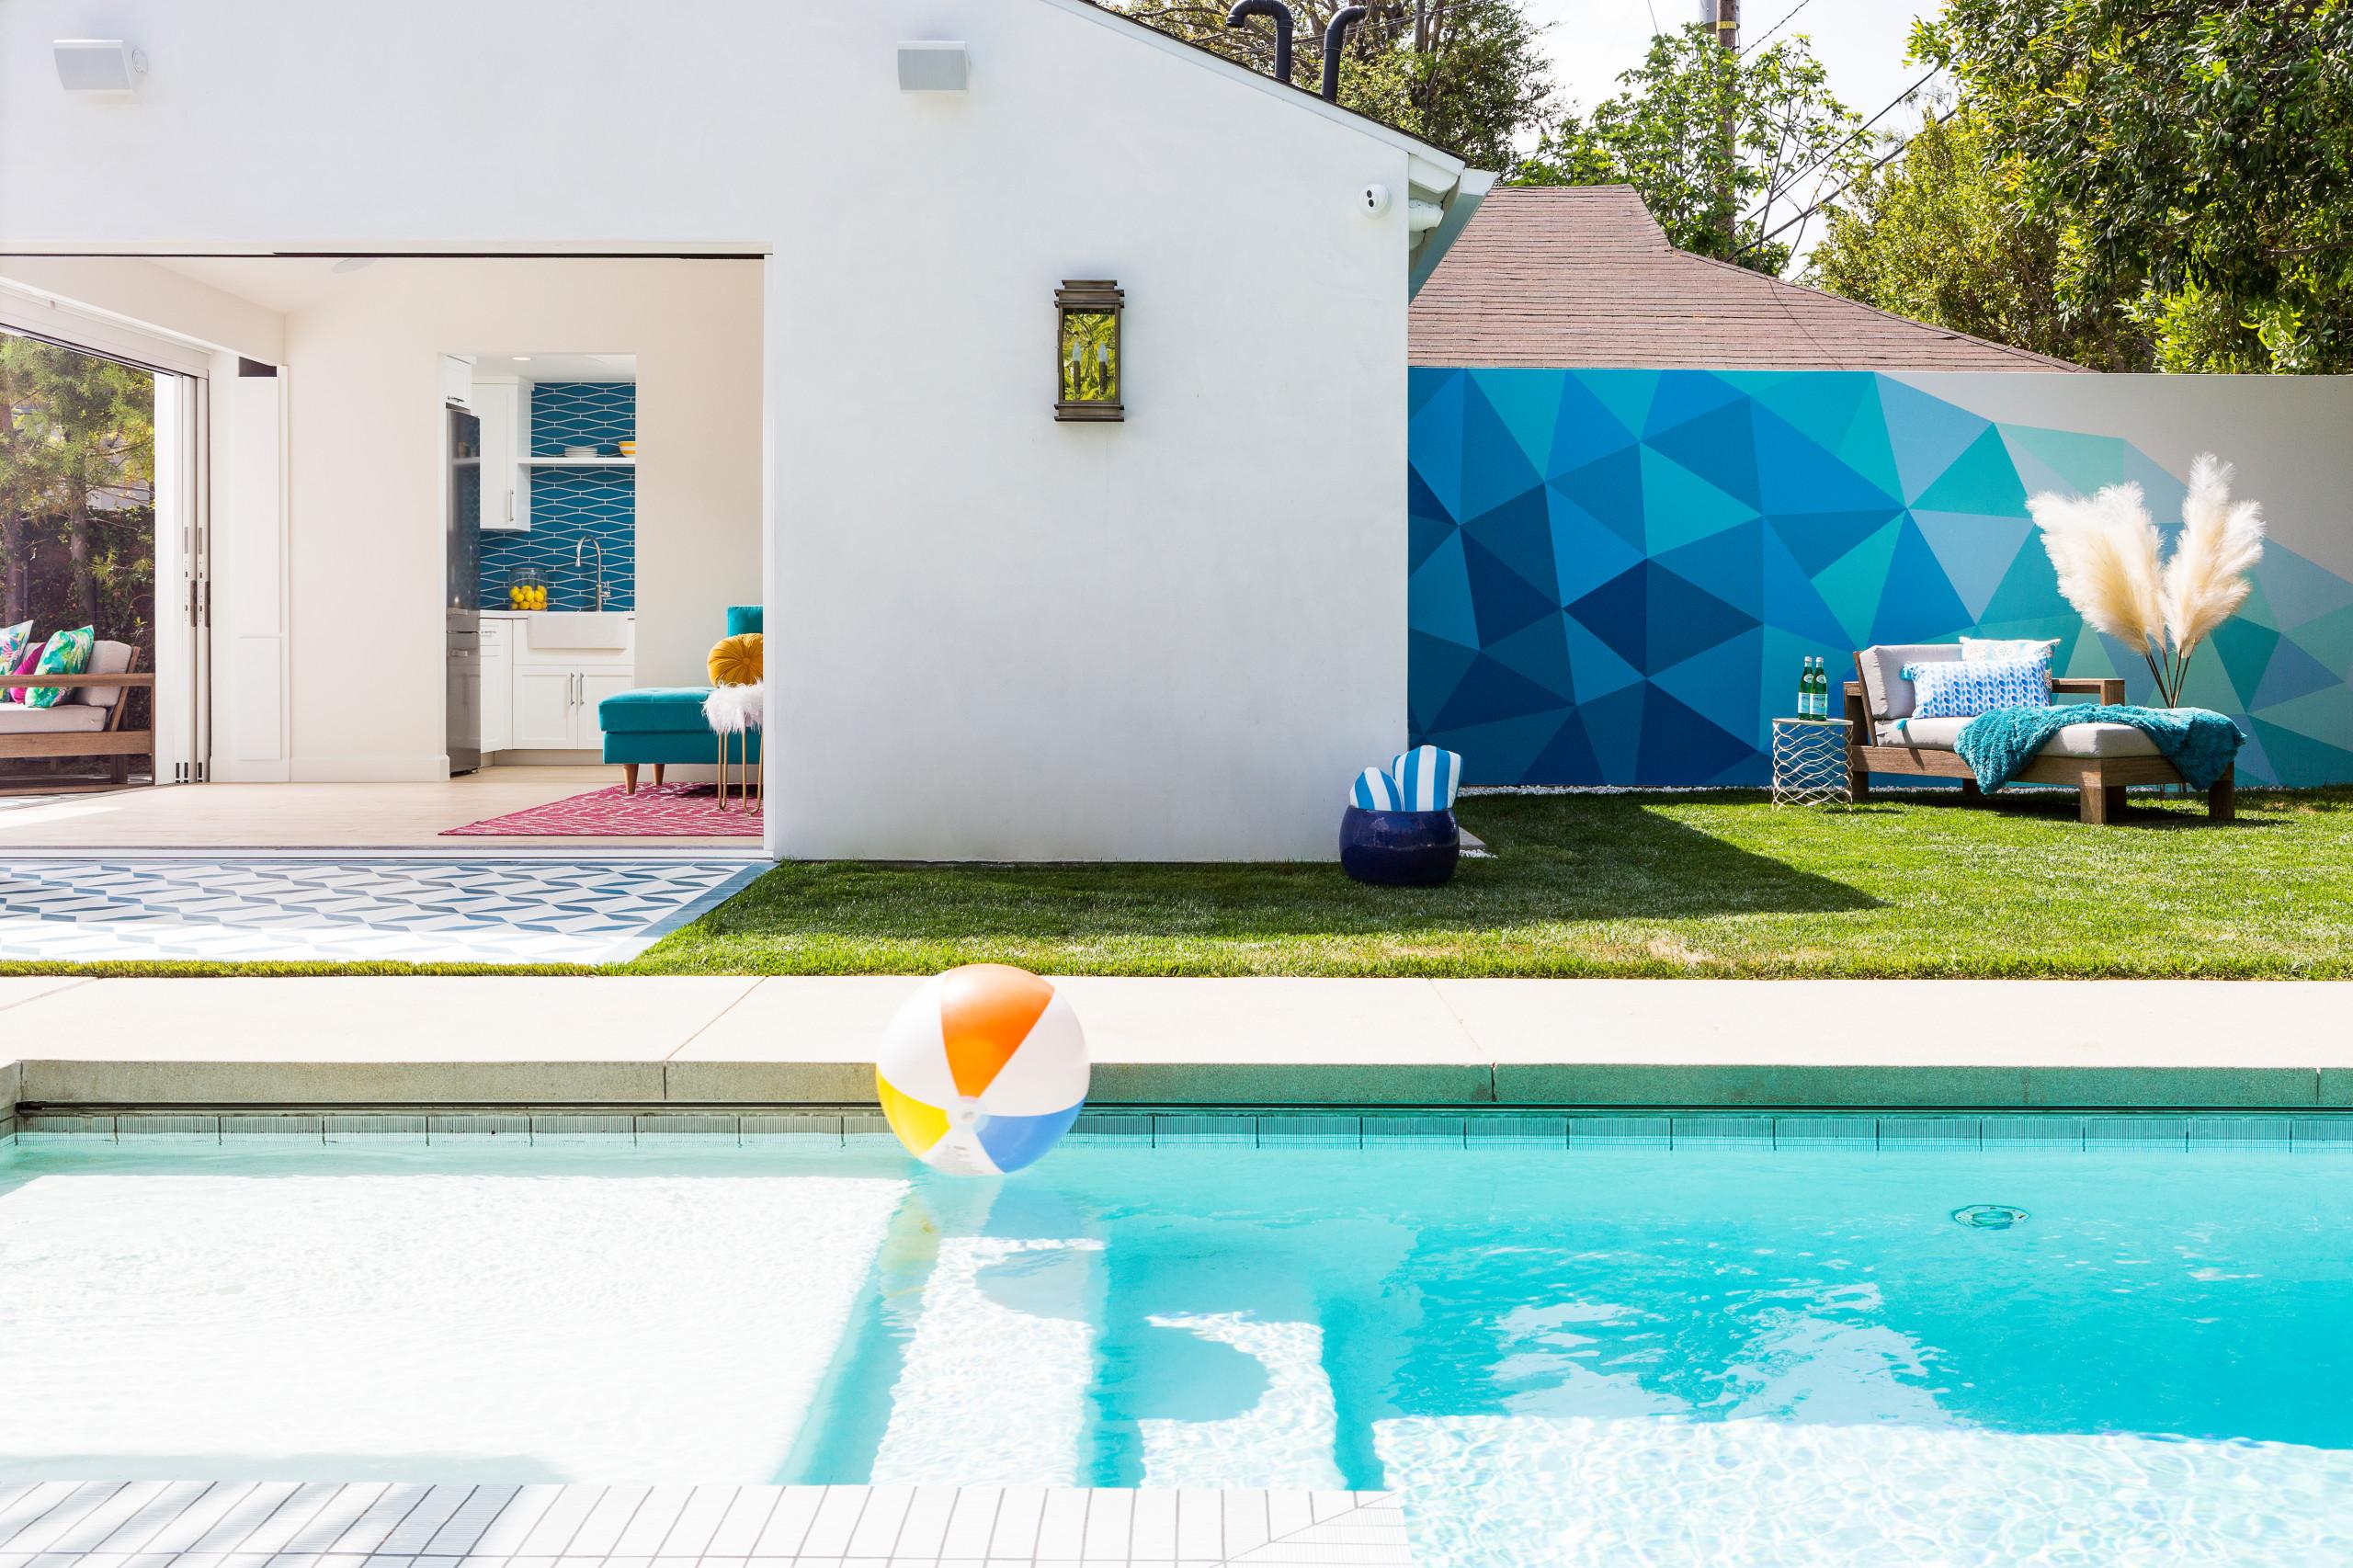 Studio City Pool House (ADU)